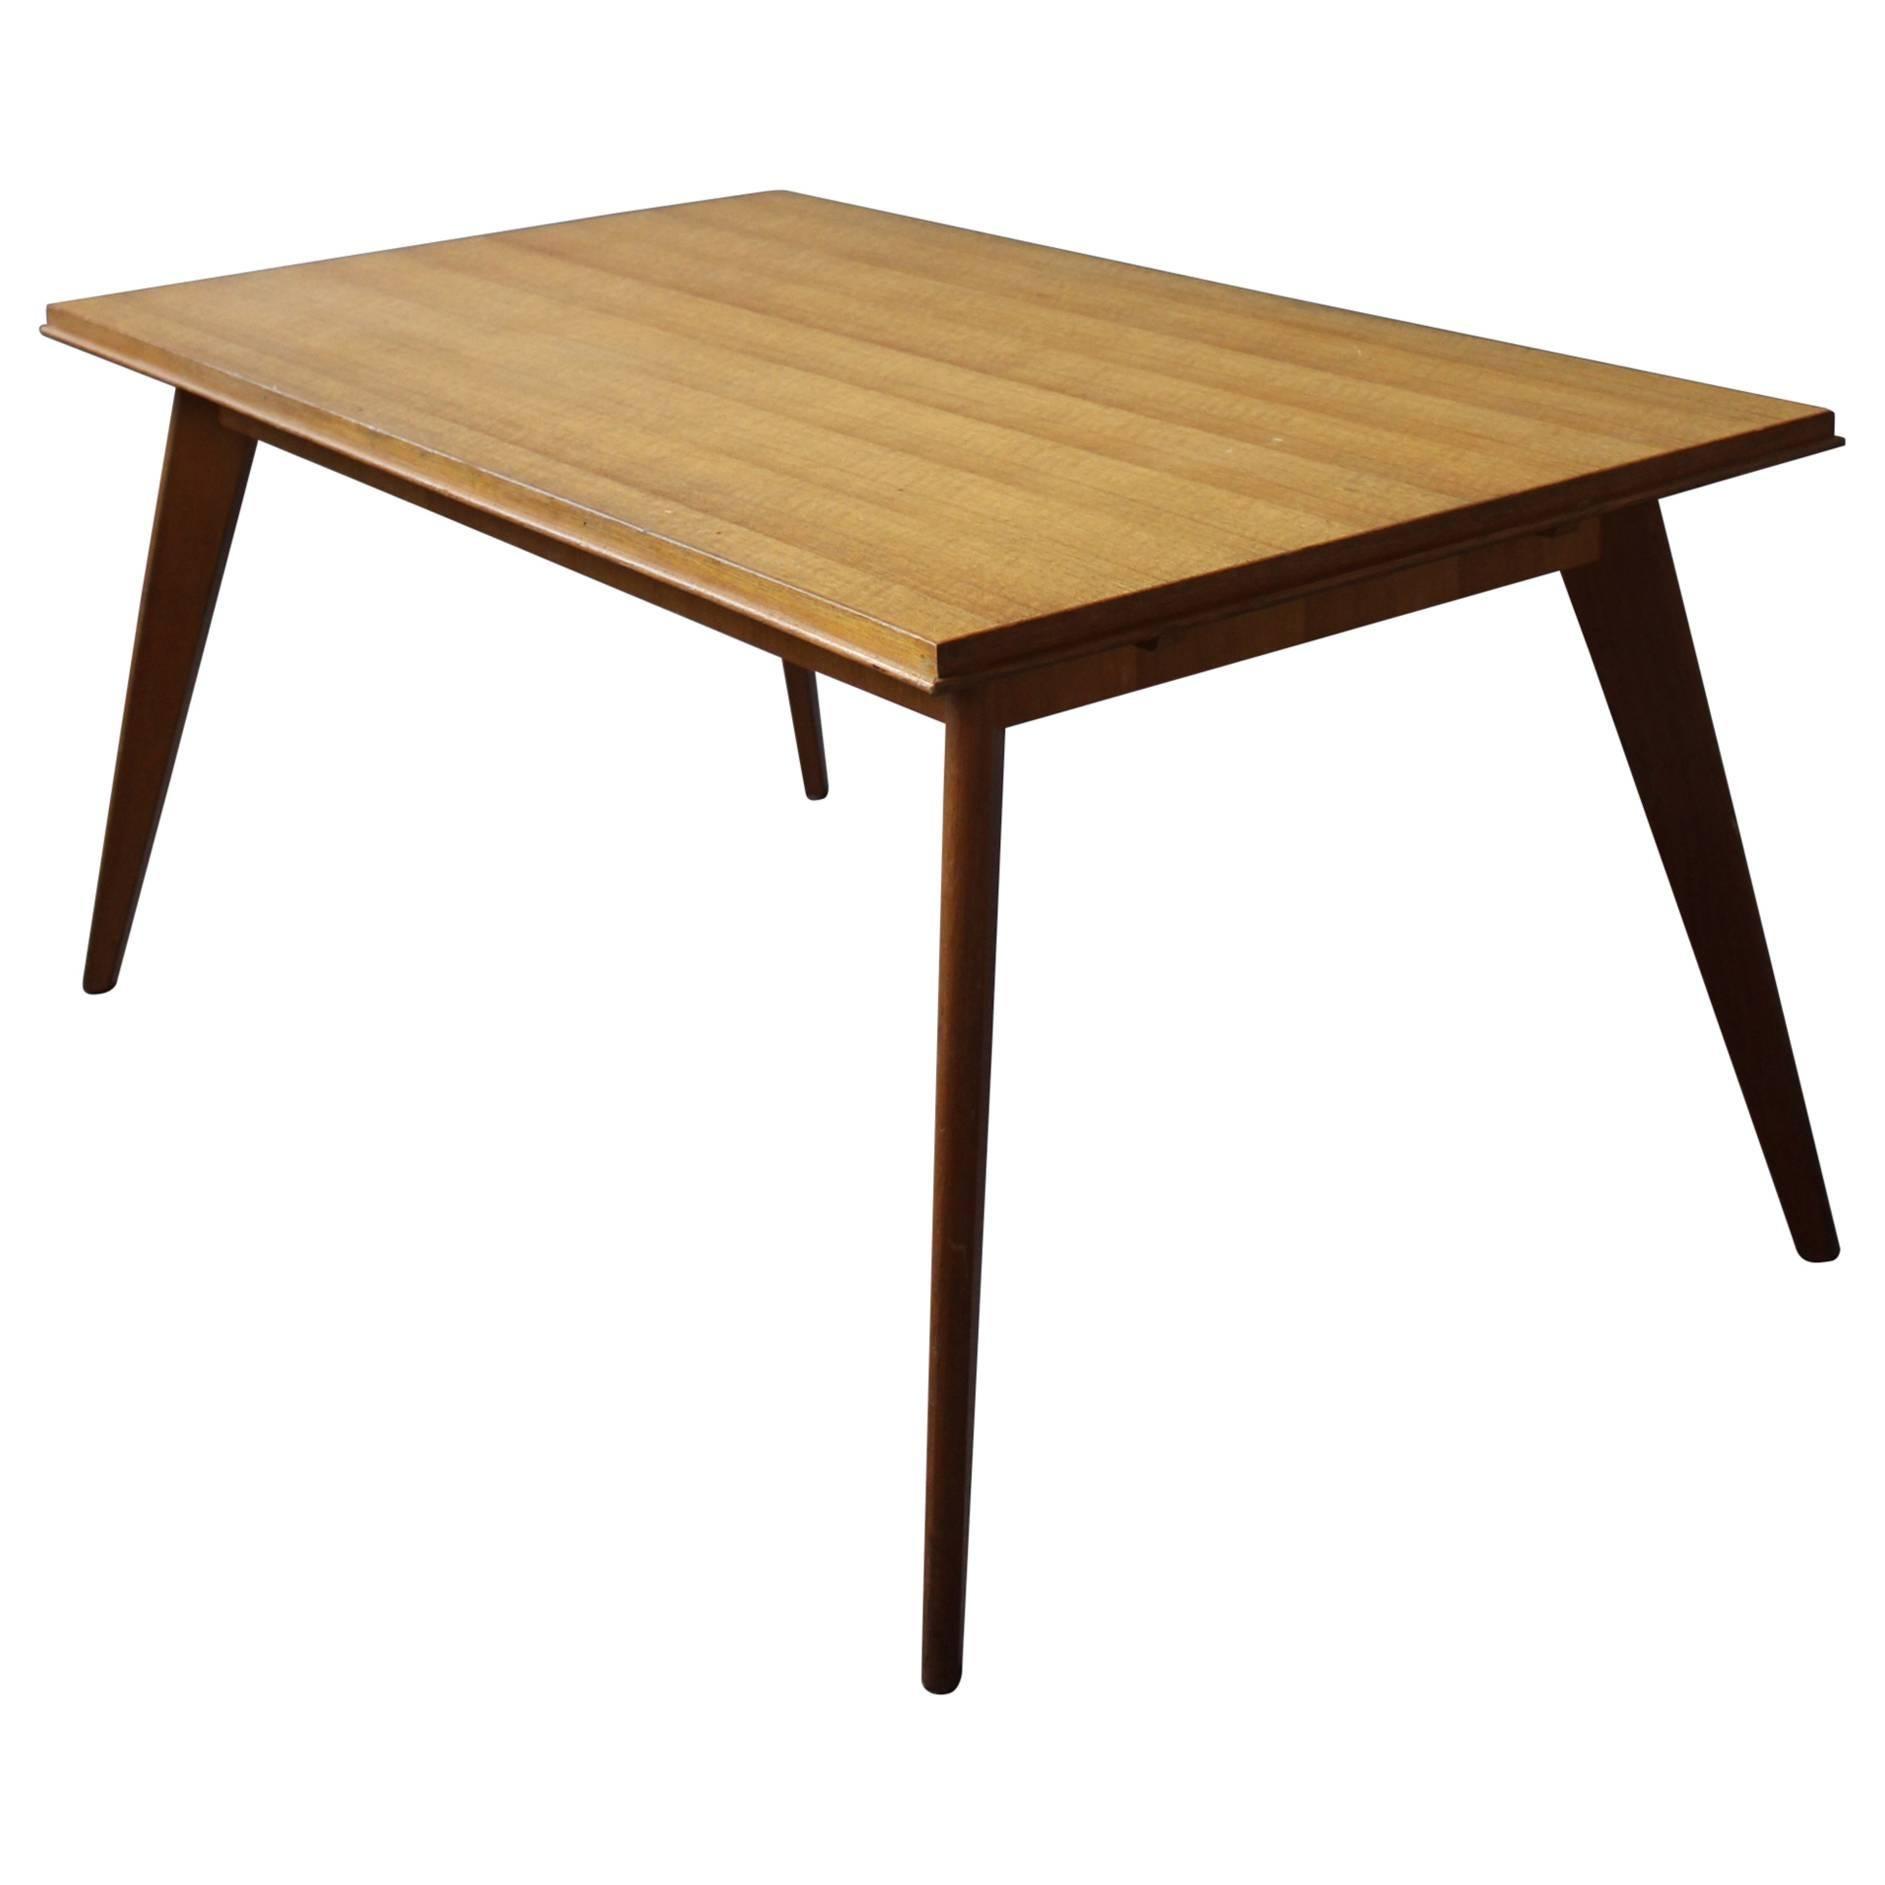 A Fine 1950s Compass Oak Table